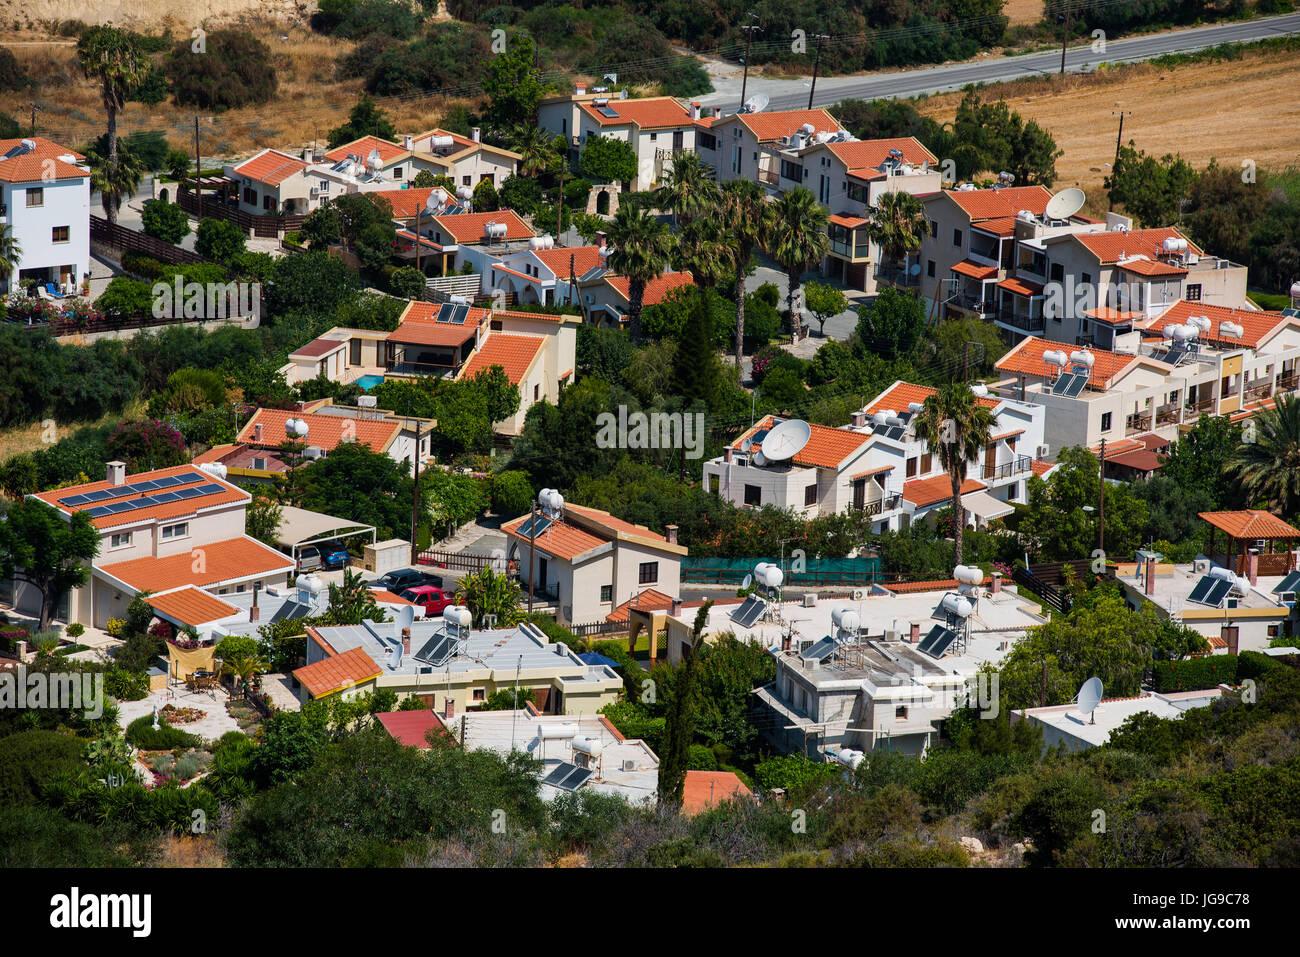 pissouri bay, cyprus - june 14, 2017: the pissouri bay resort is a